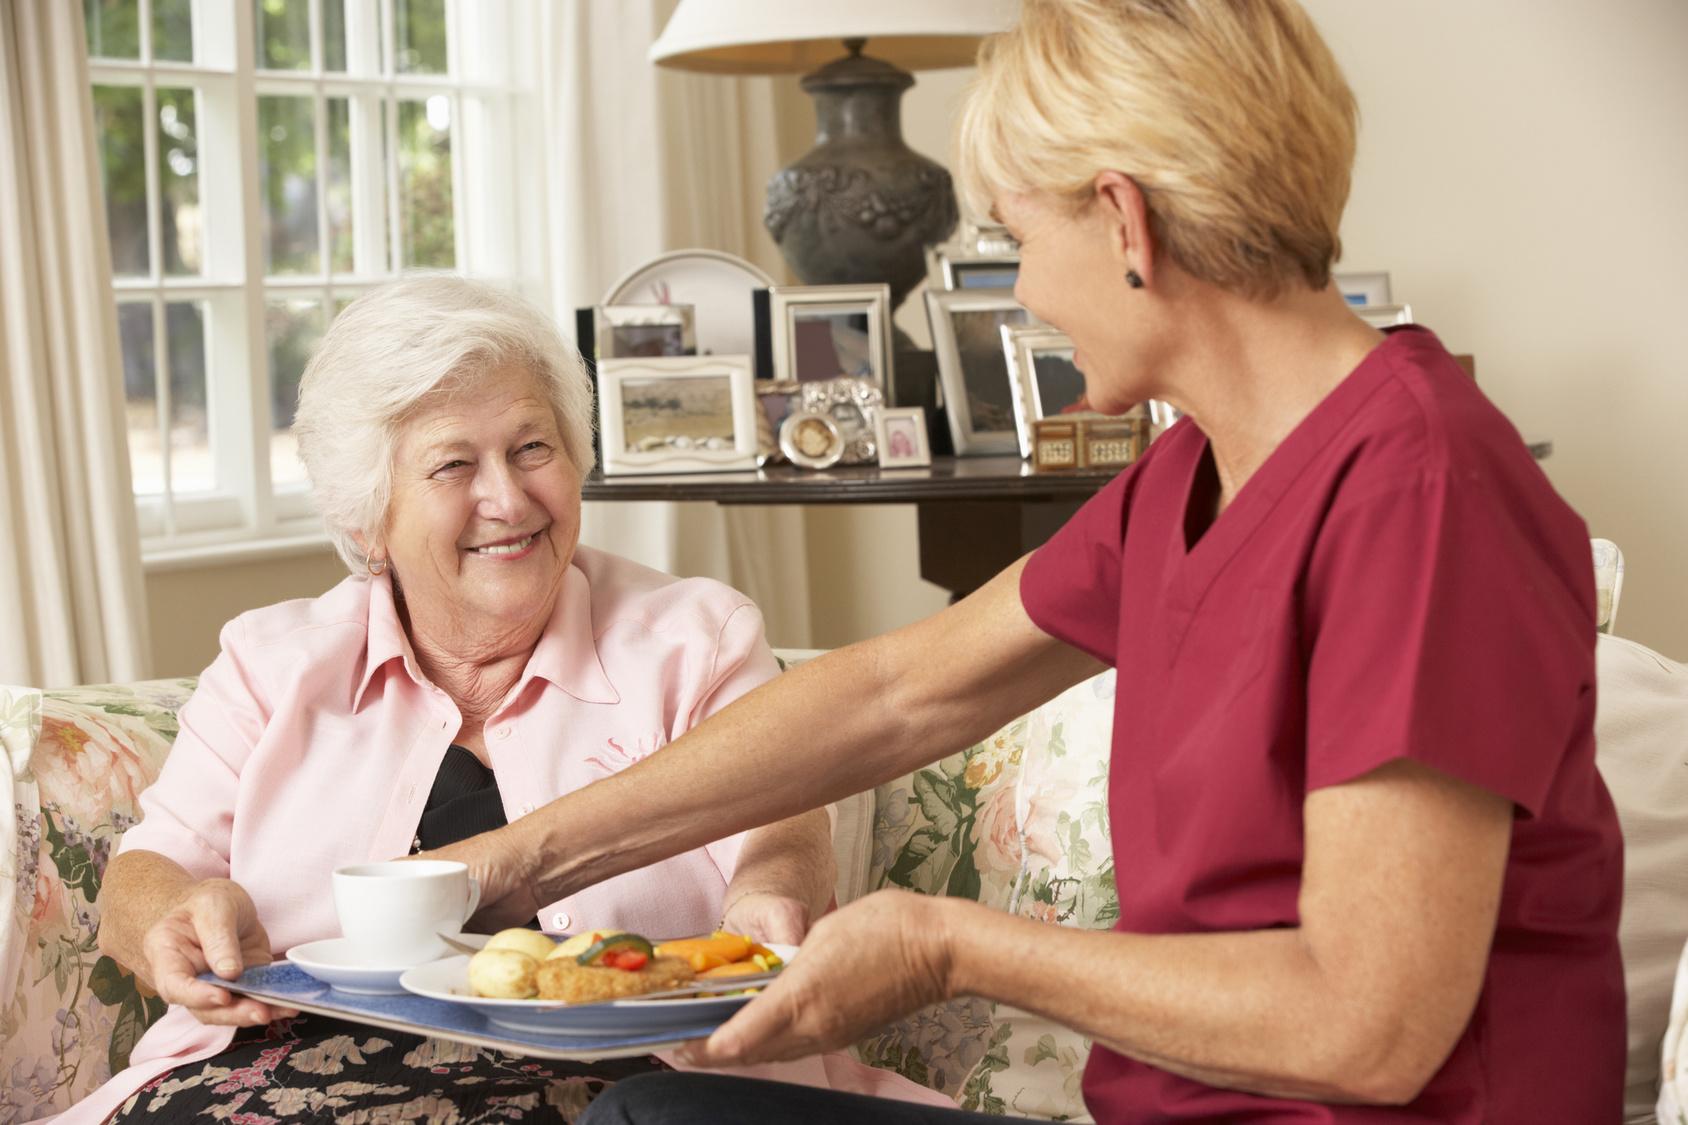 Elderly home care in Joliet Illinois